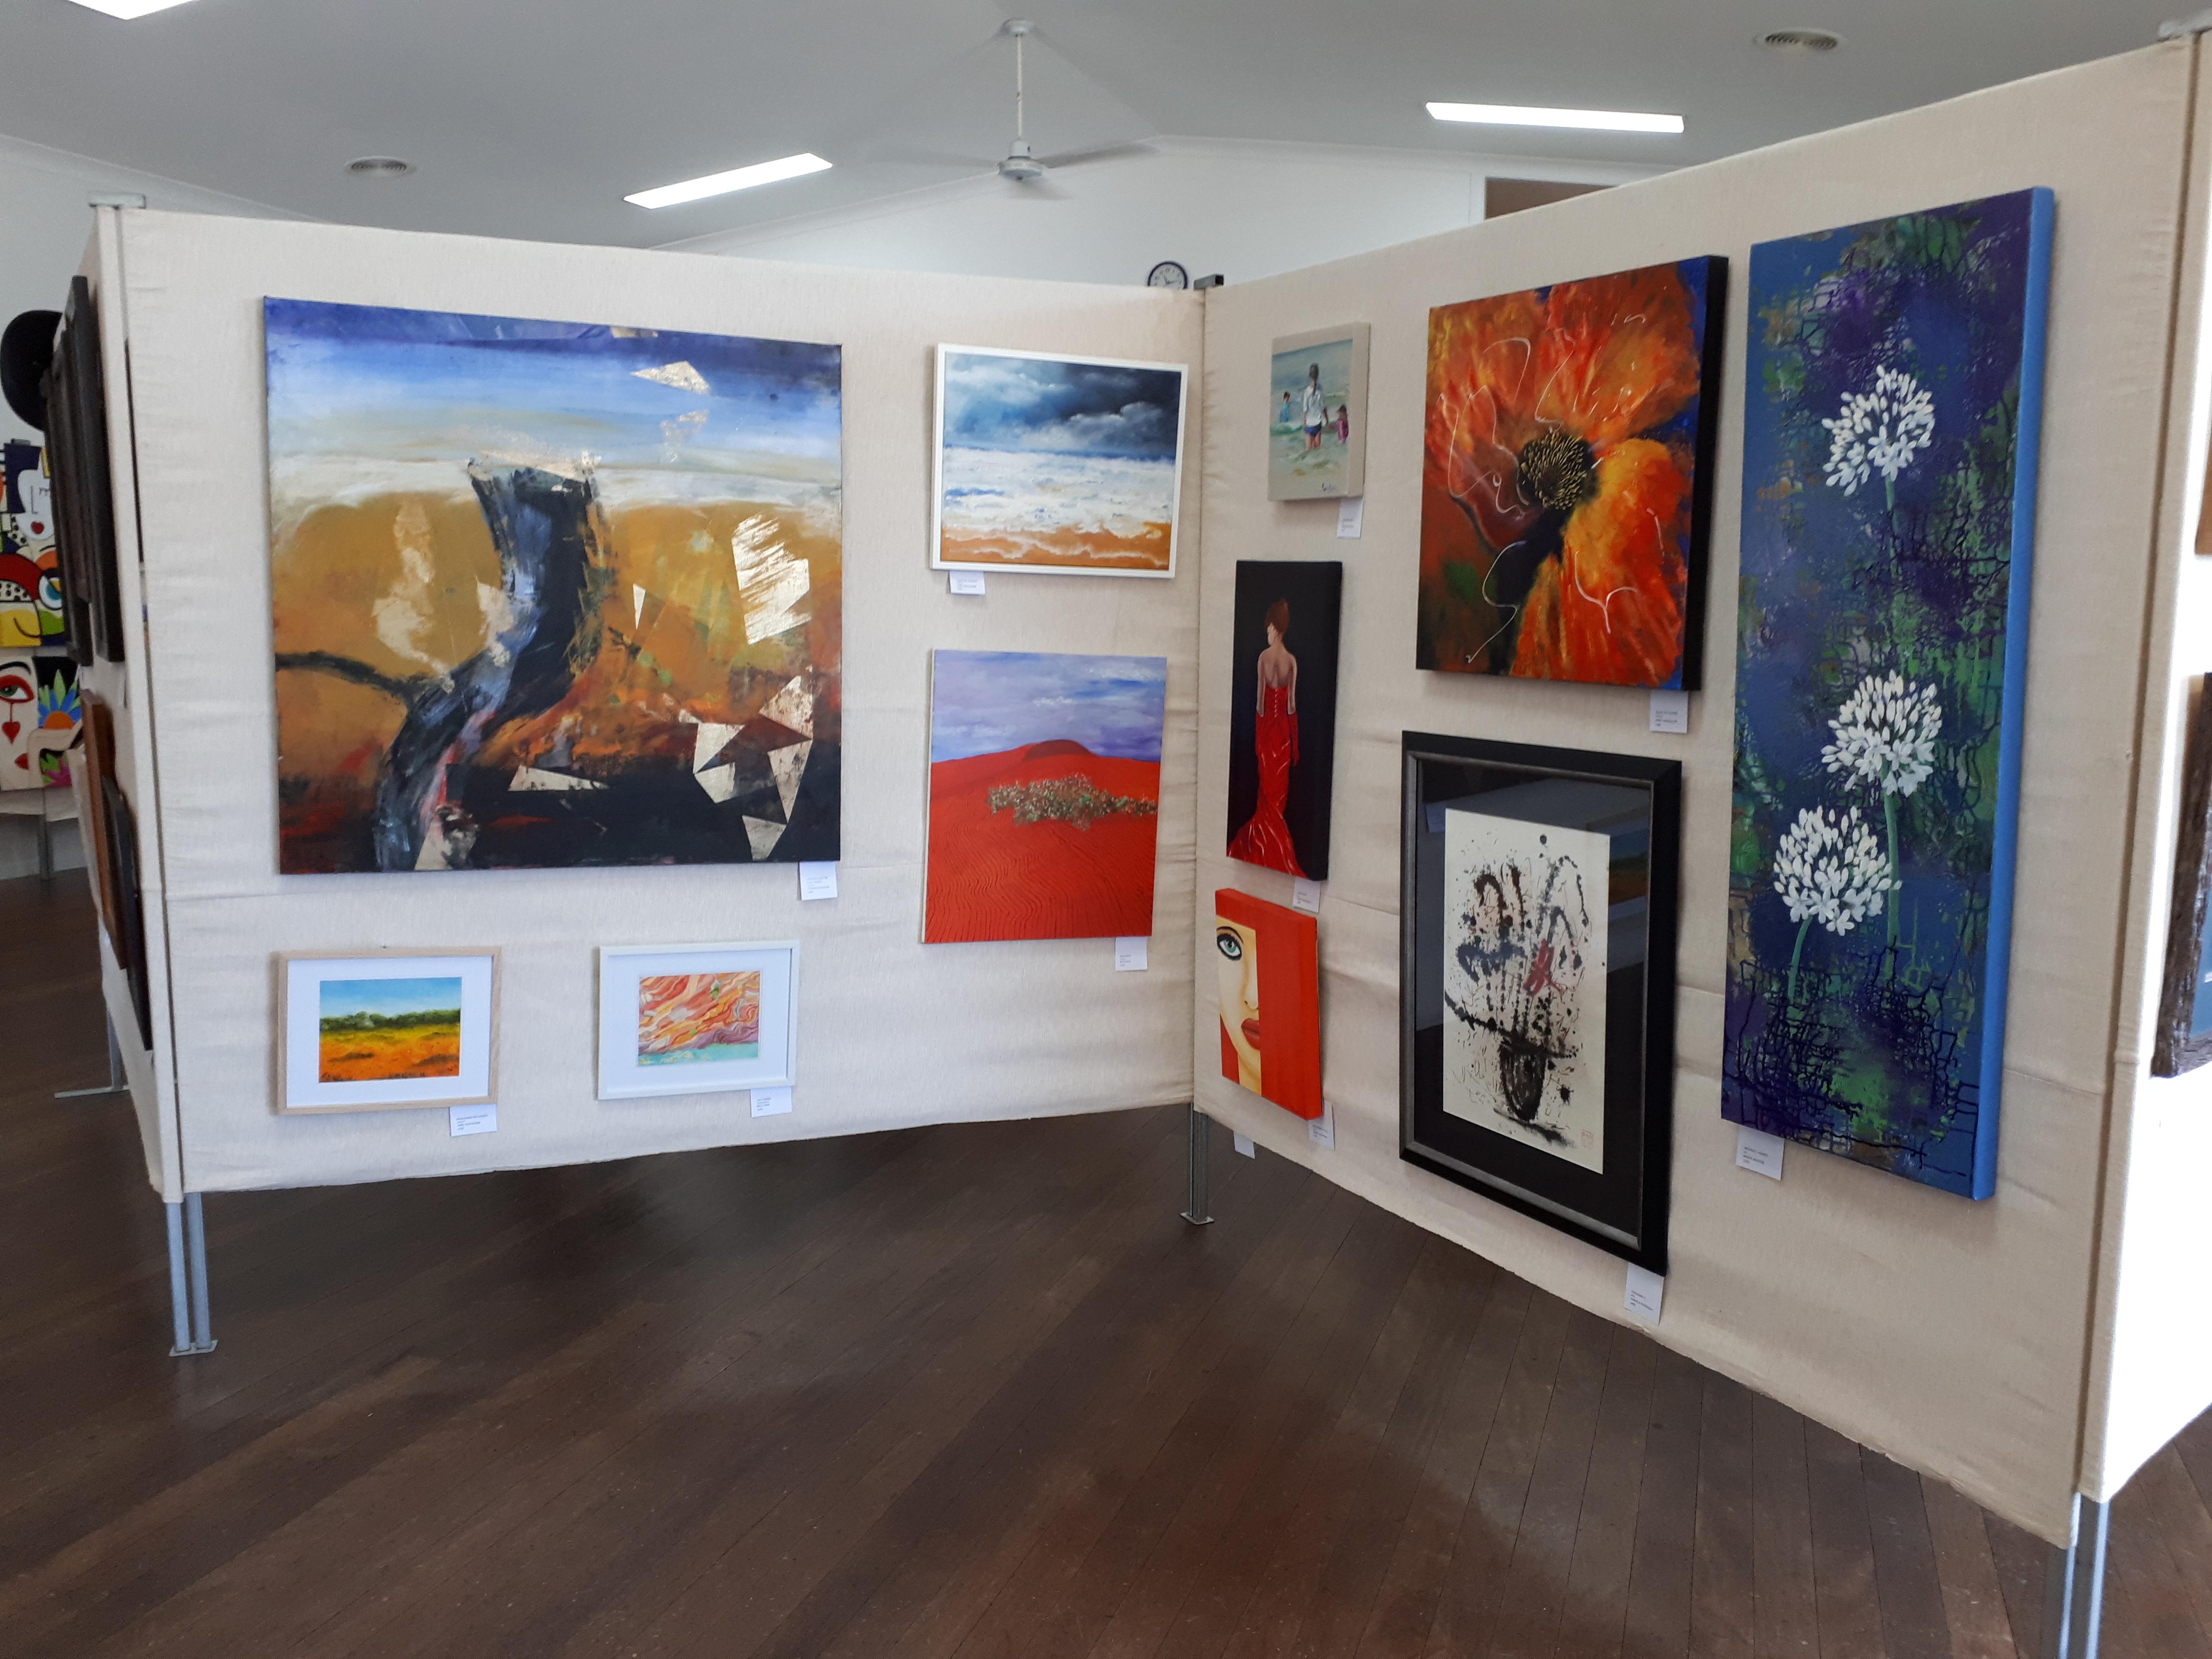 Art & Craft 317 November 2019 Exhibition